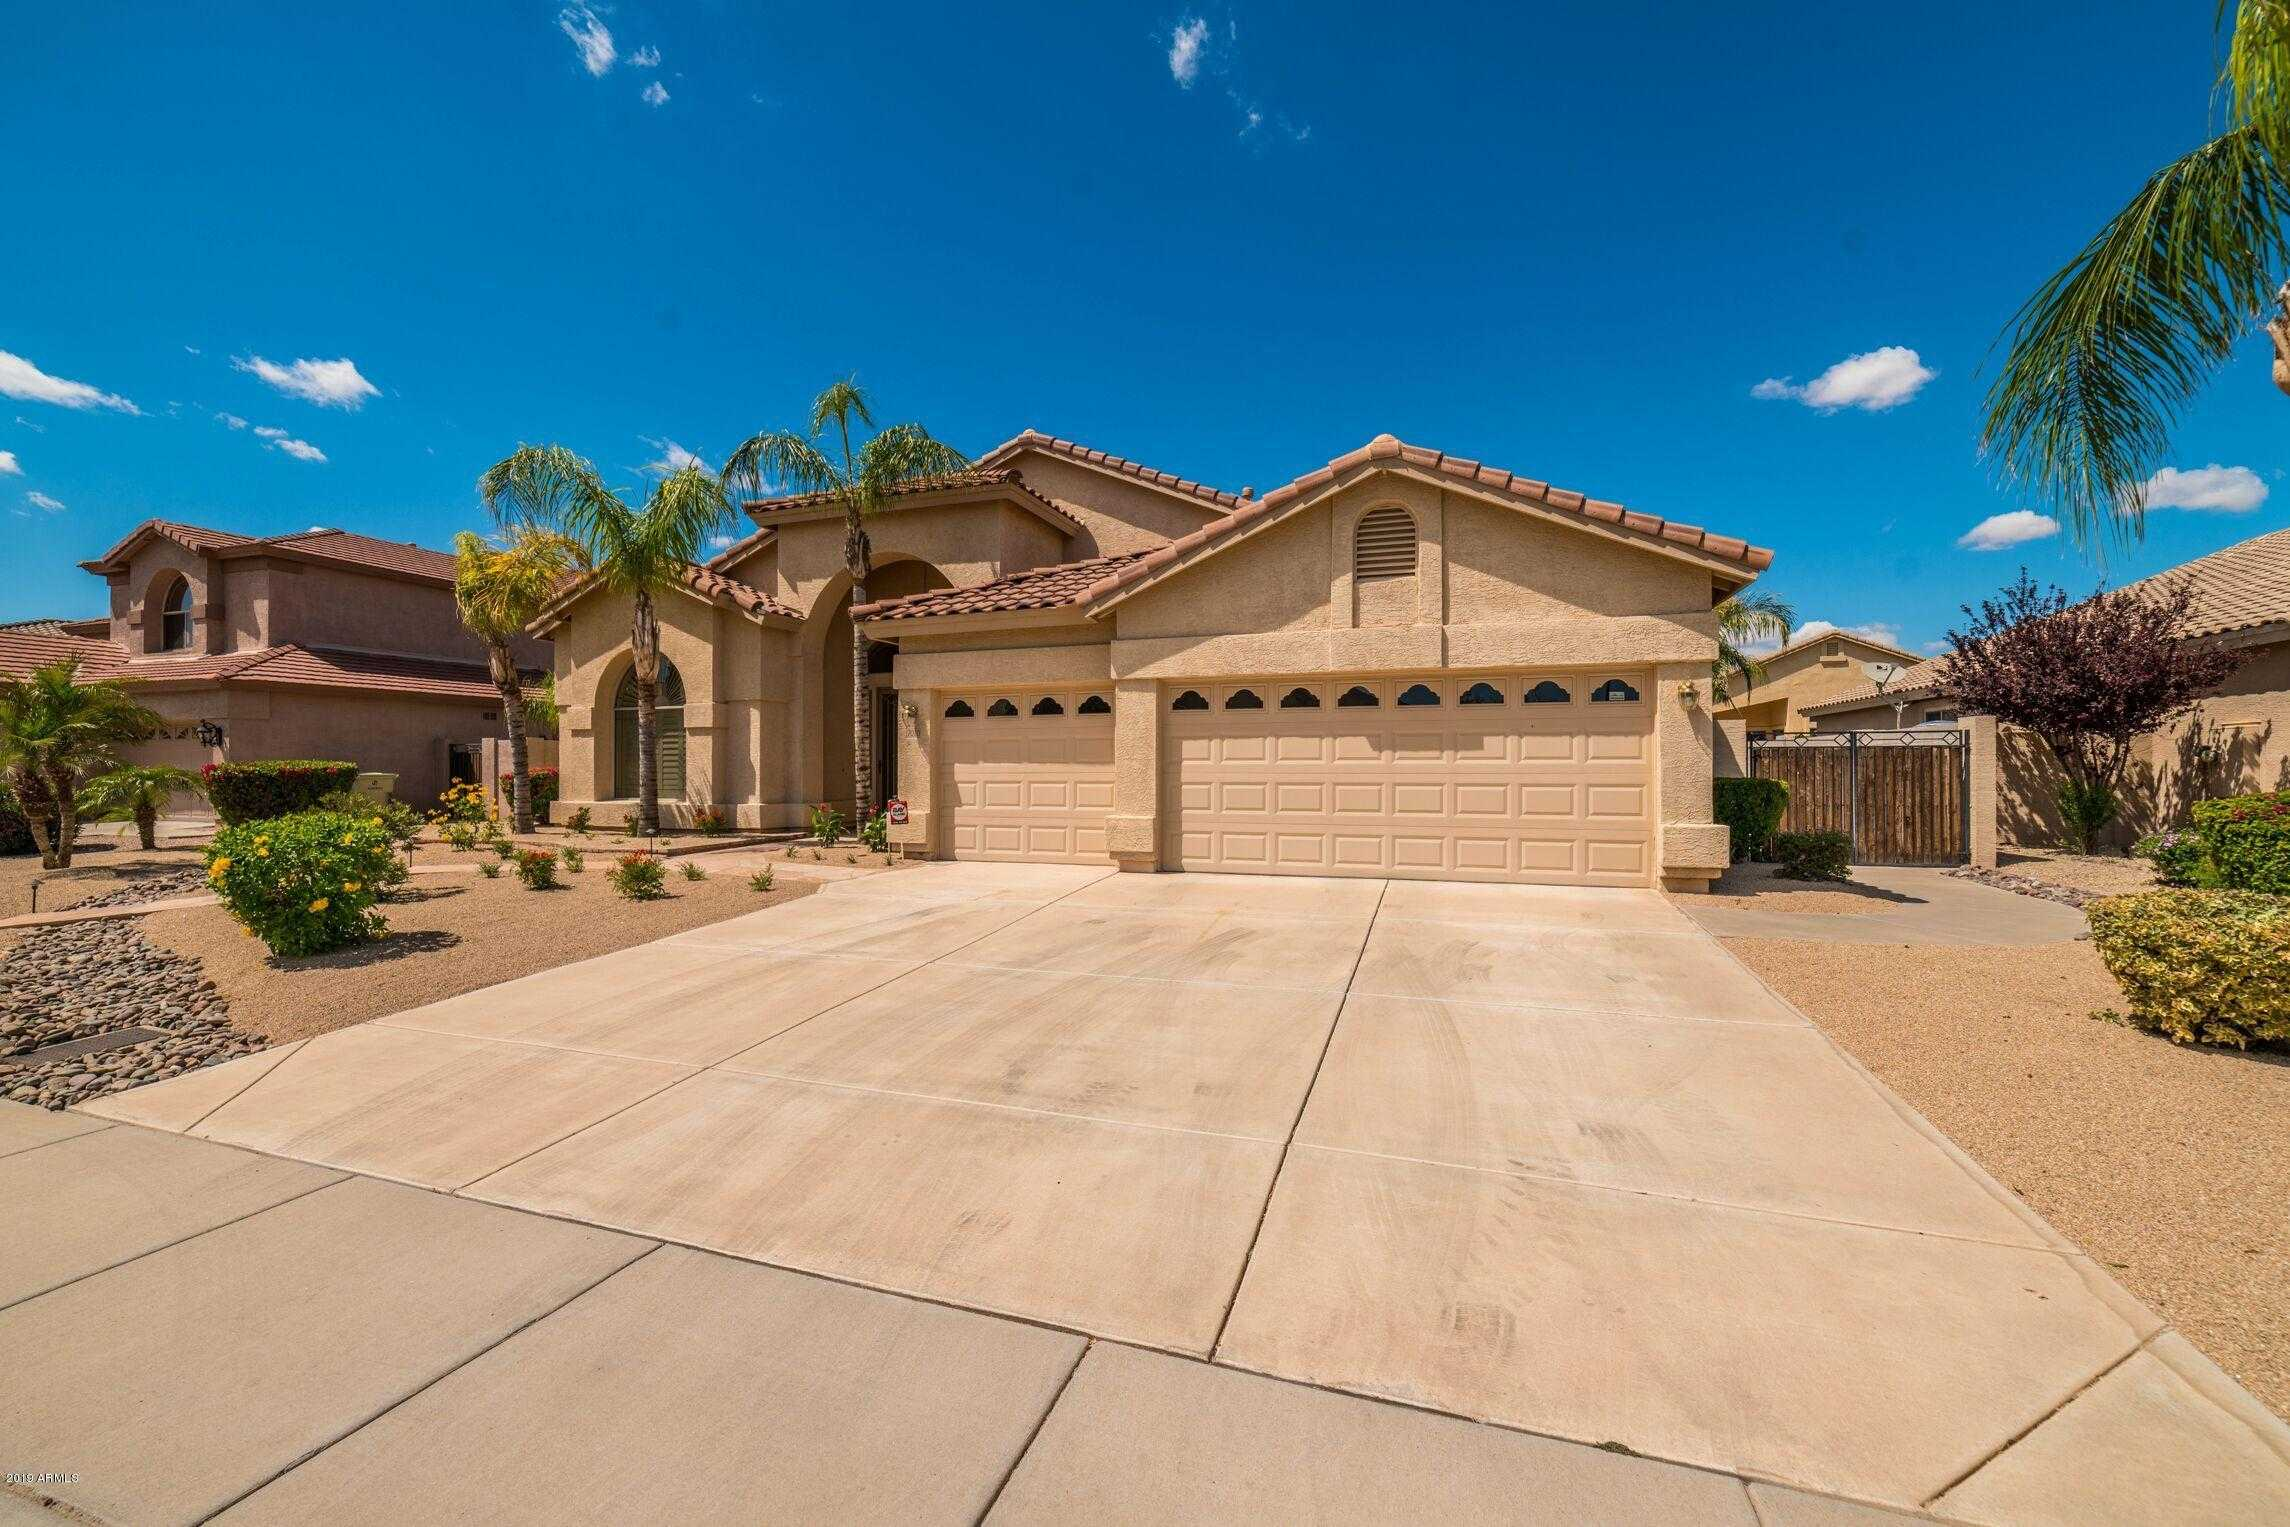 $529,500 - 4Br/3Ba - Home for Sale in Sierra Verde Parcel C, Glendale